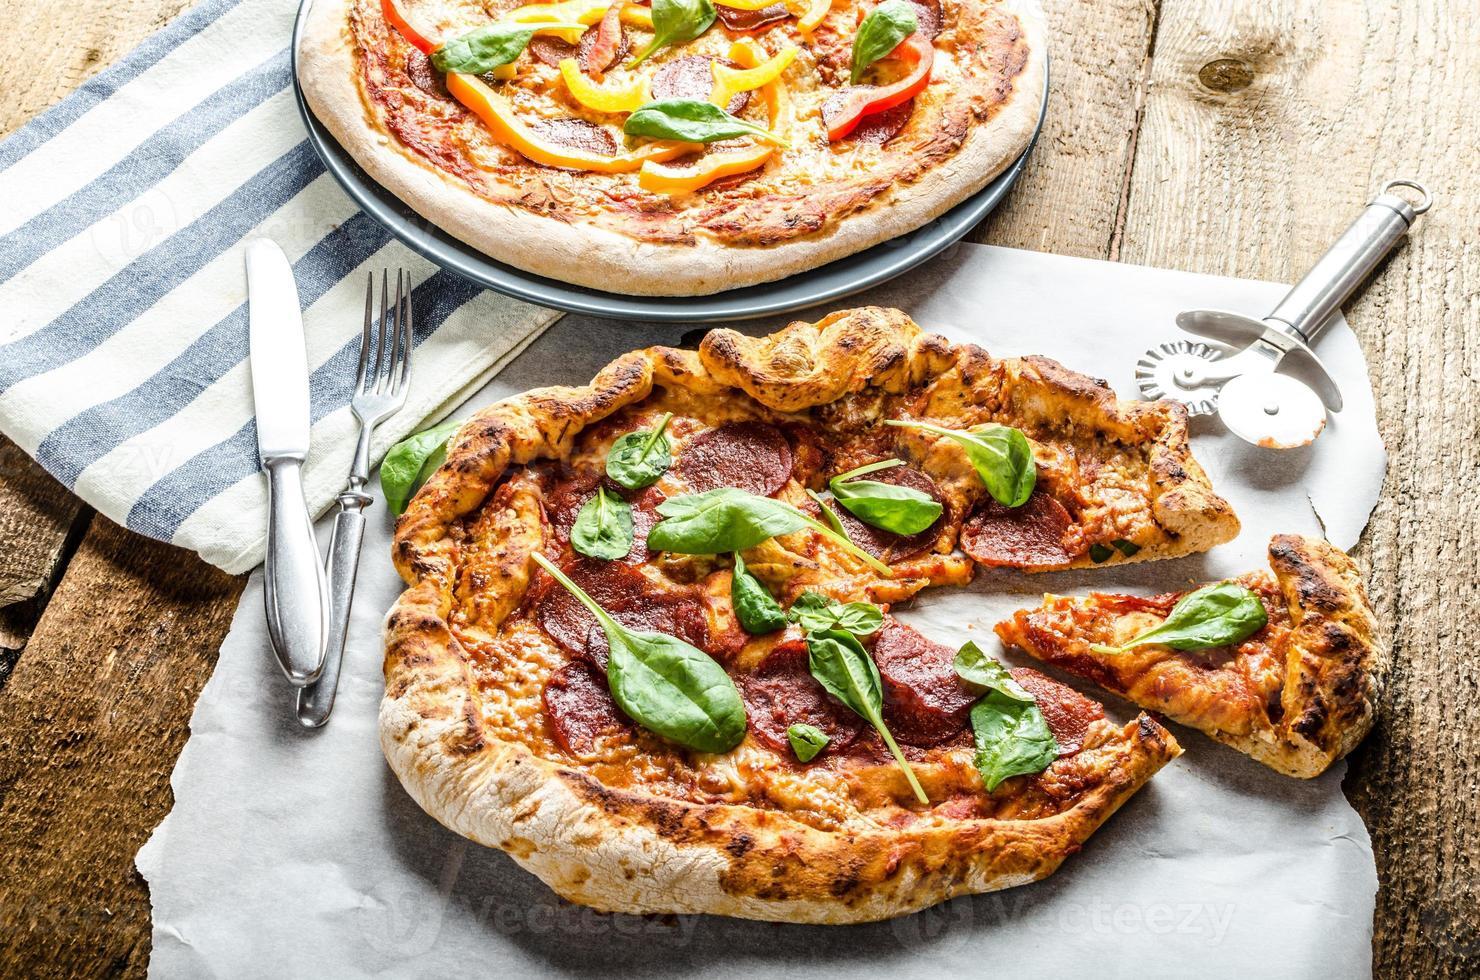 rustik pizza foto